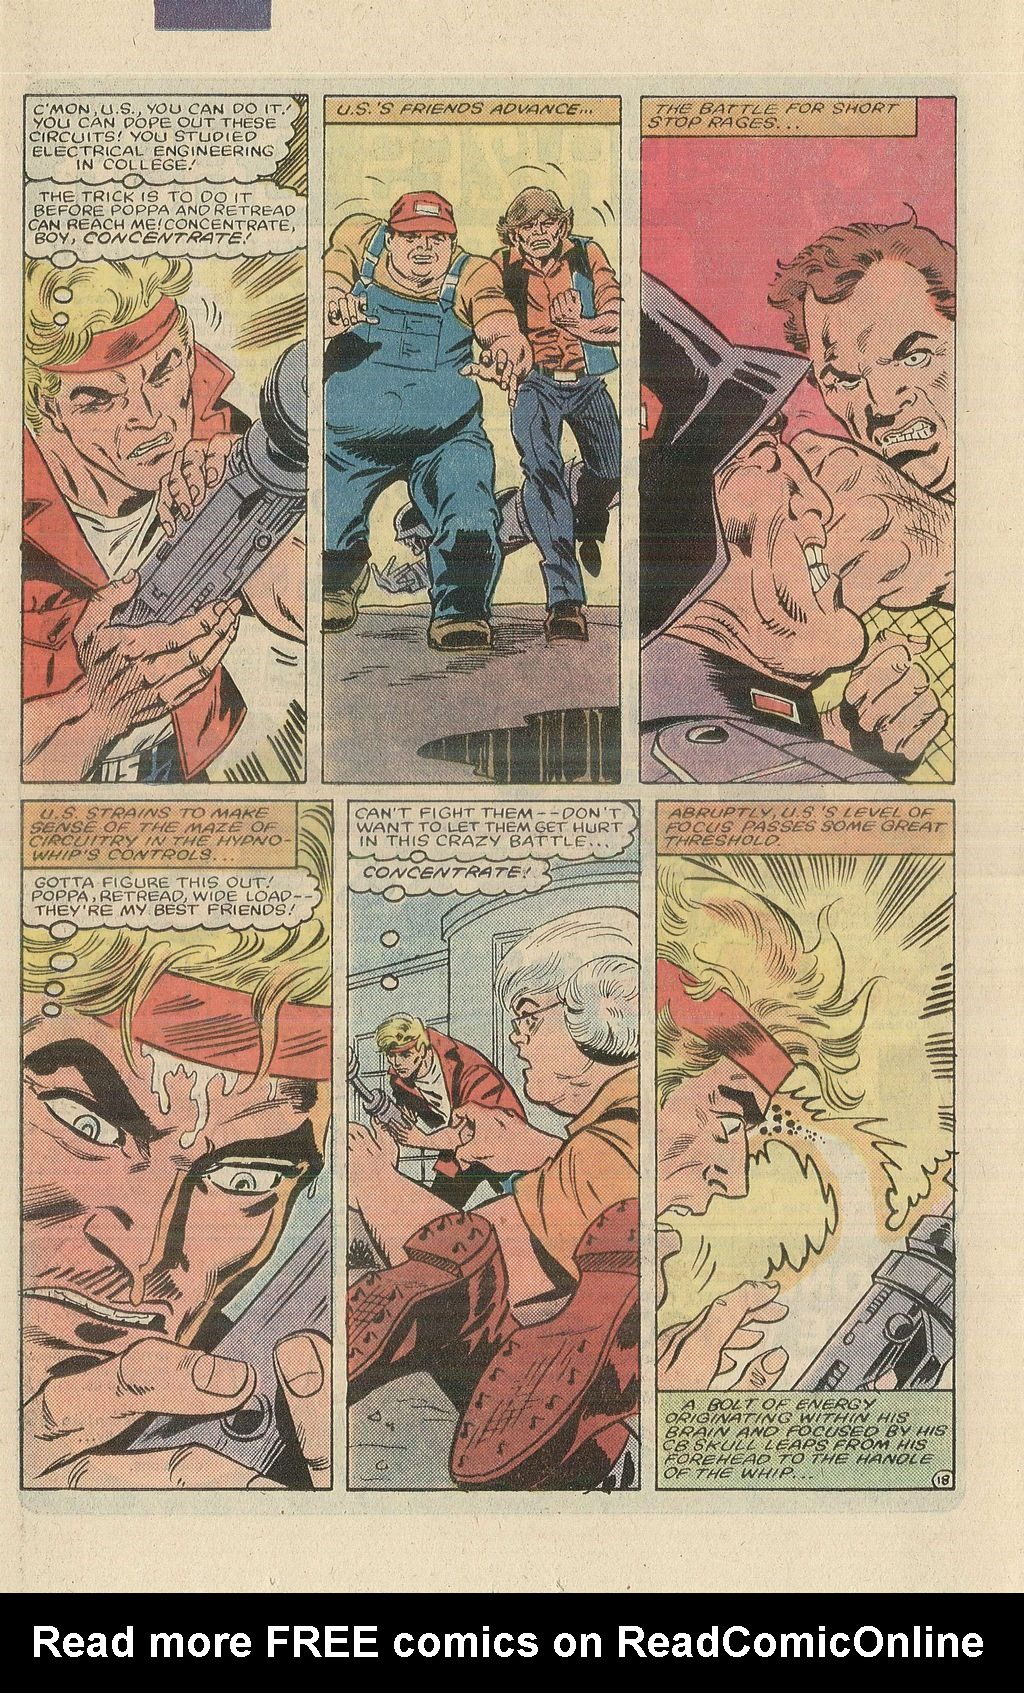 Read online U.S. 1 comic -  Issue #9 - 26